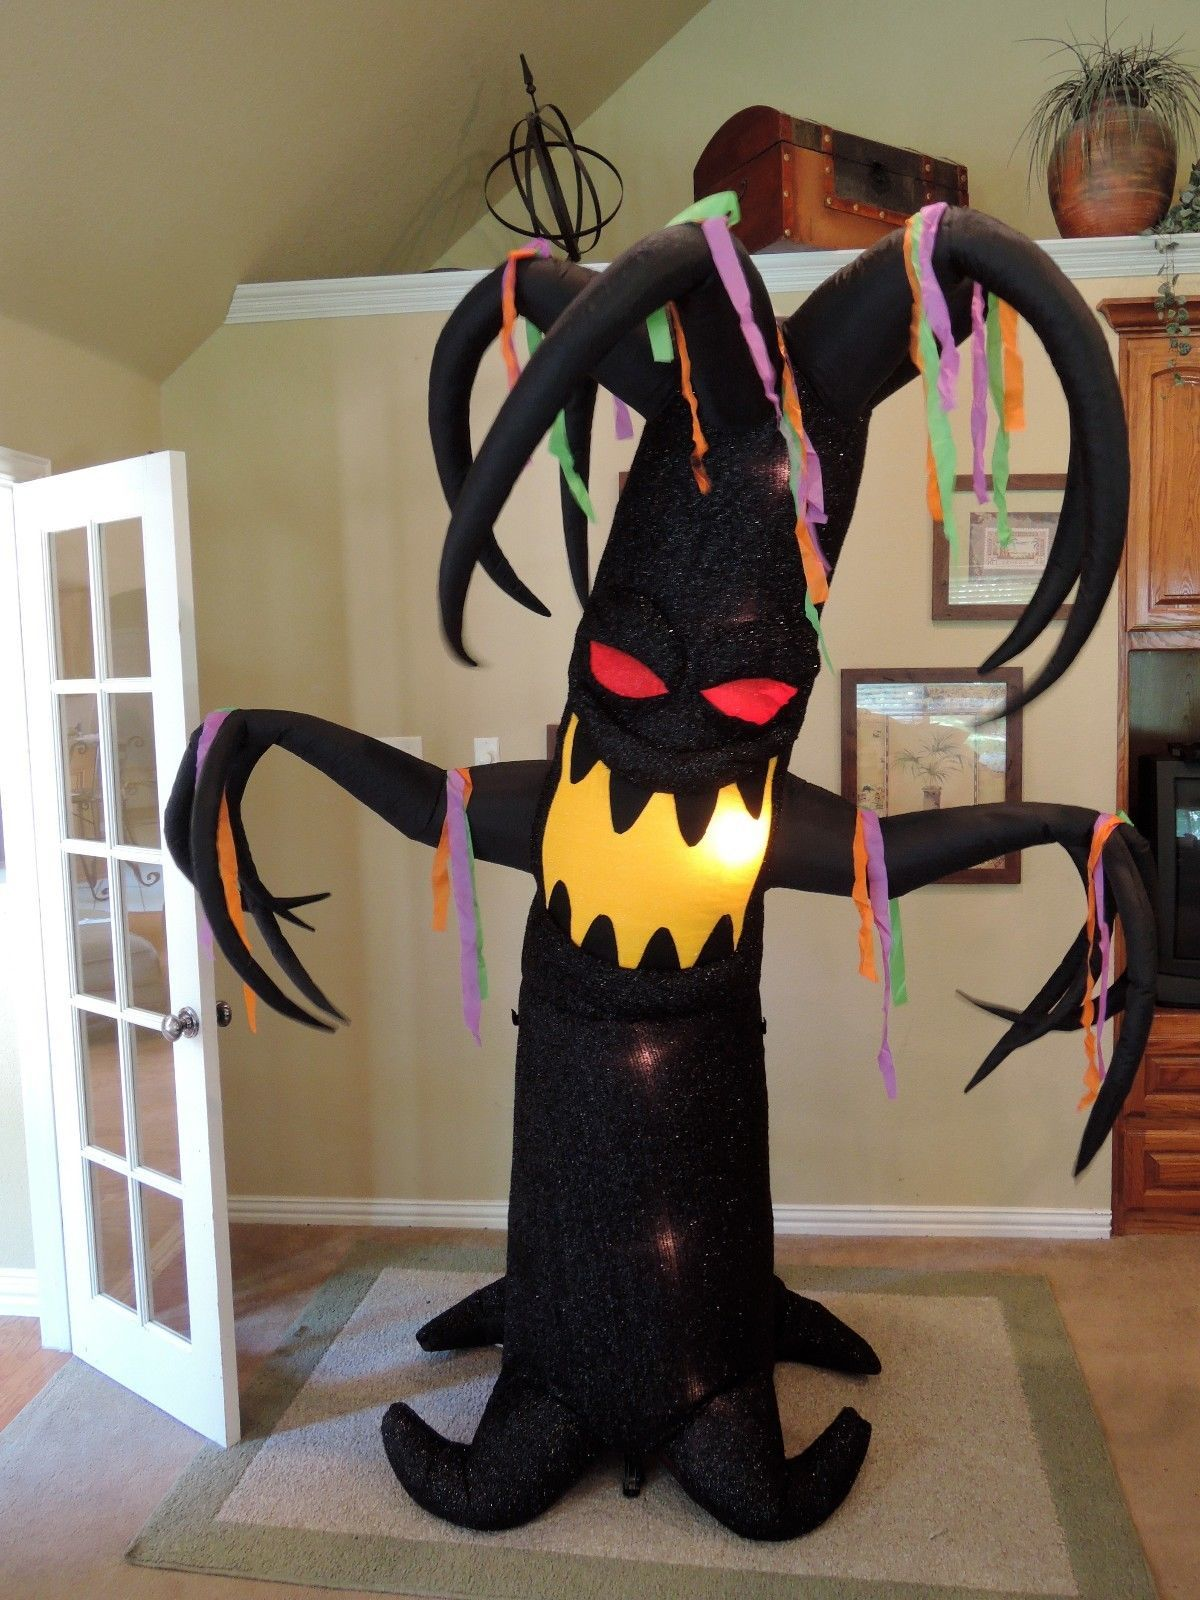 http://www.ebay.com/itm/Gemmy-Halloween-Shaking-Tree-Inflatable-Airblown-/141672859419?pt=LH_DefaultDomain_0